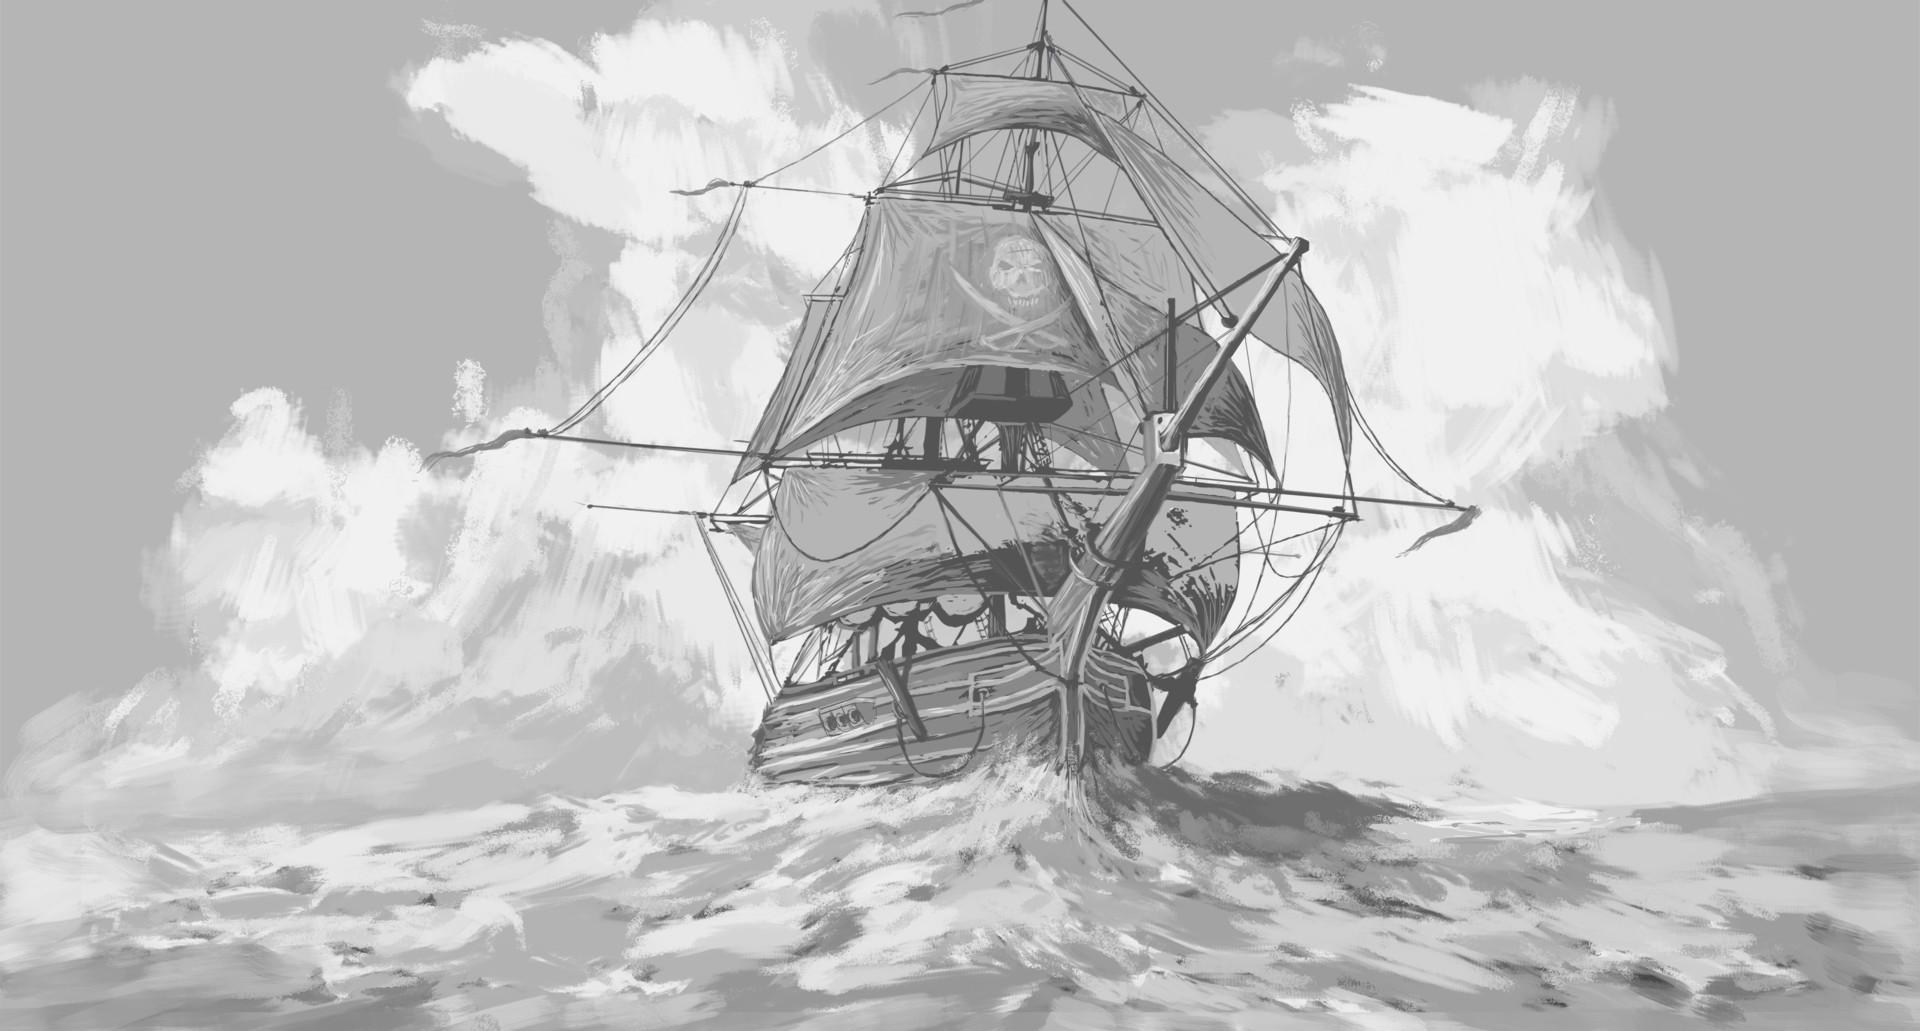 Martin seidl fancy pirate ship first